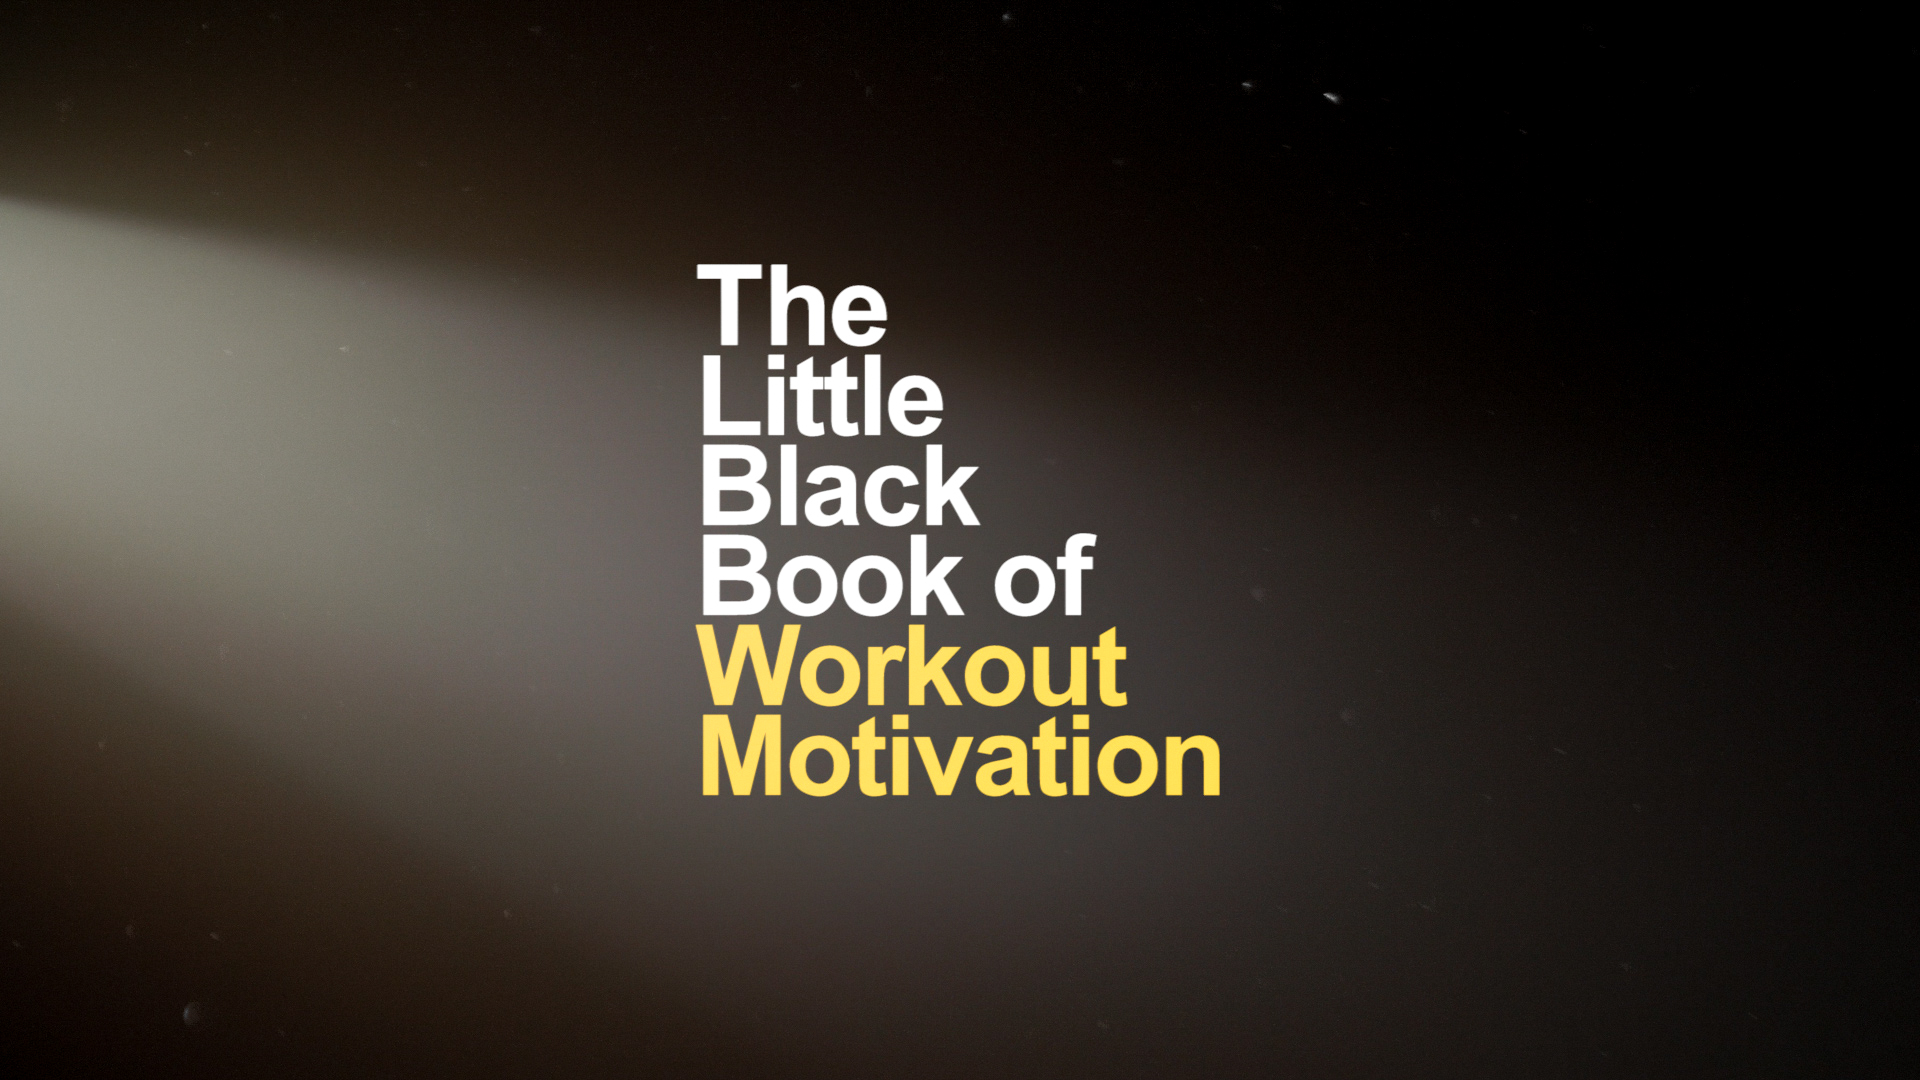 Little-Black-Book-30.jpg